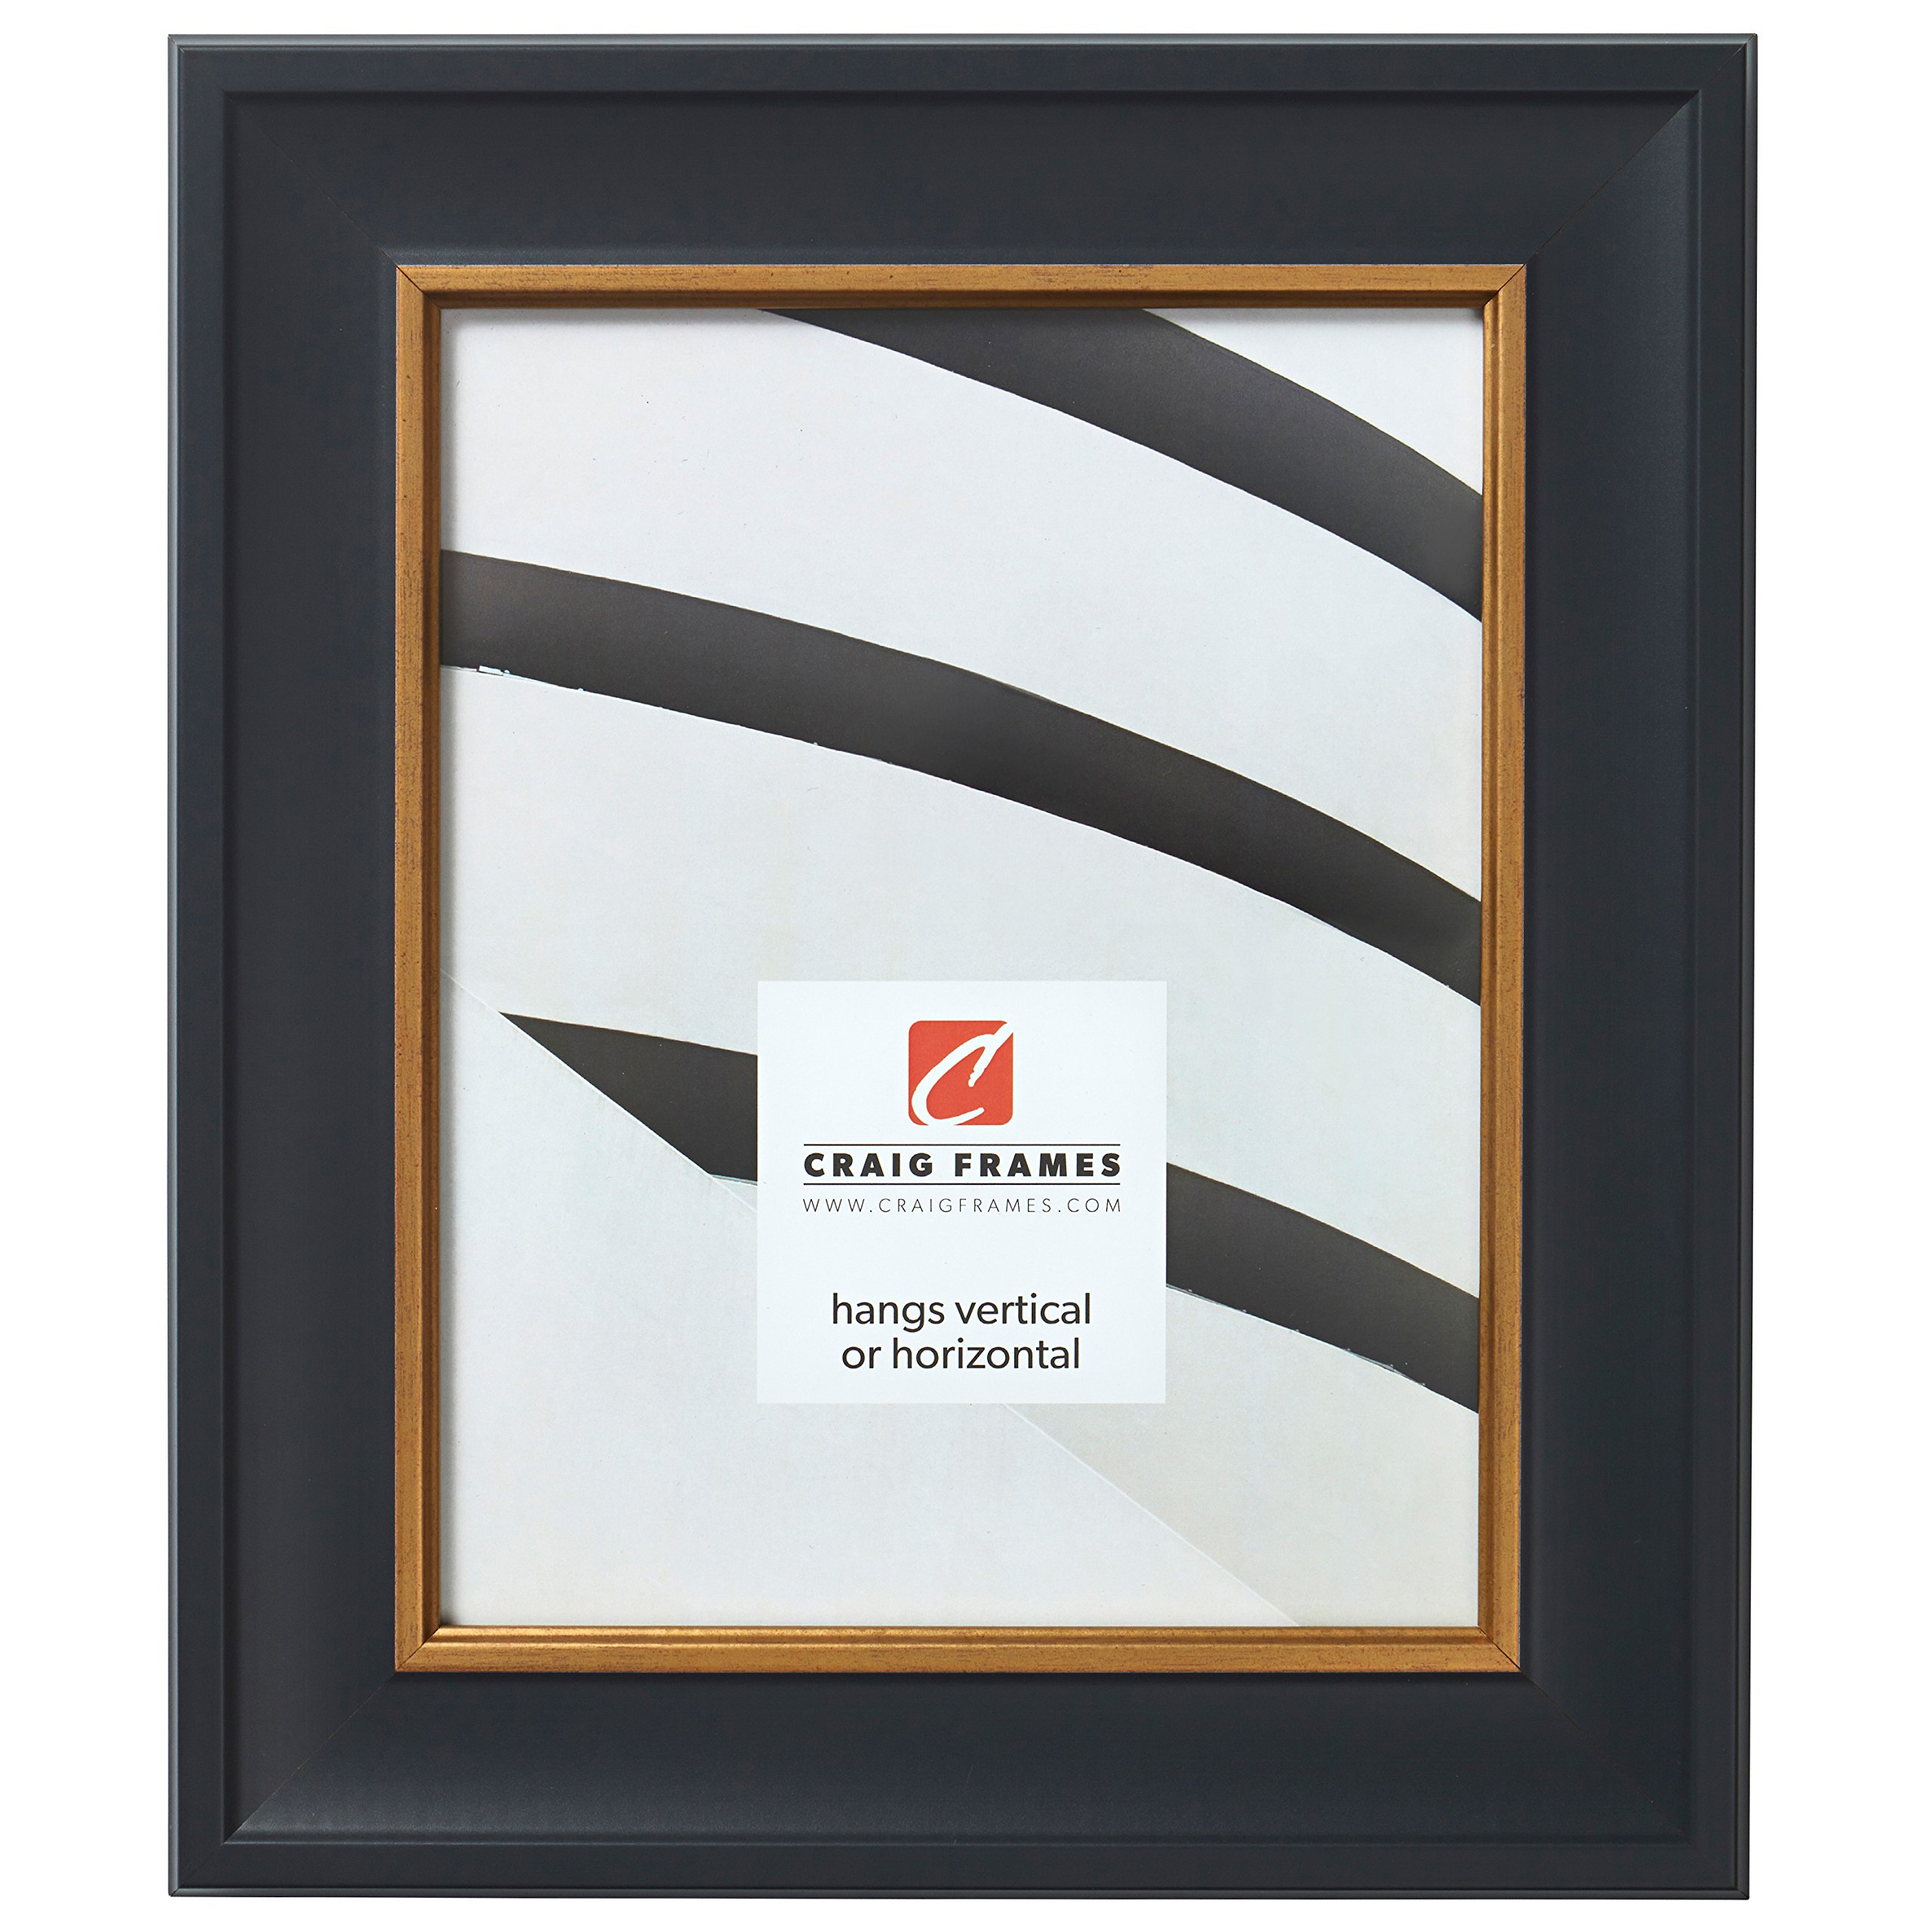 Craig Frames Martin Picture Frame, 4 x 6 Inch, Black Velvet with Gold